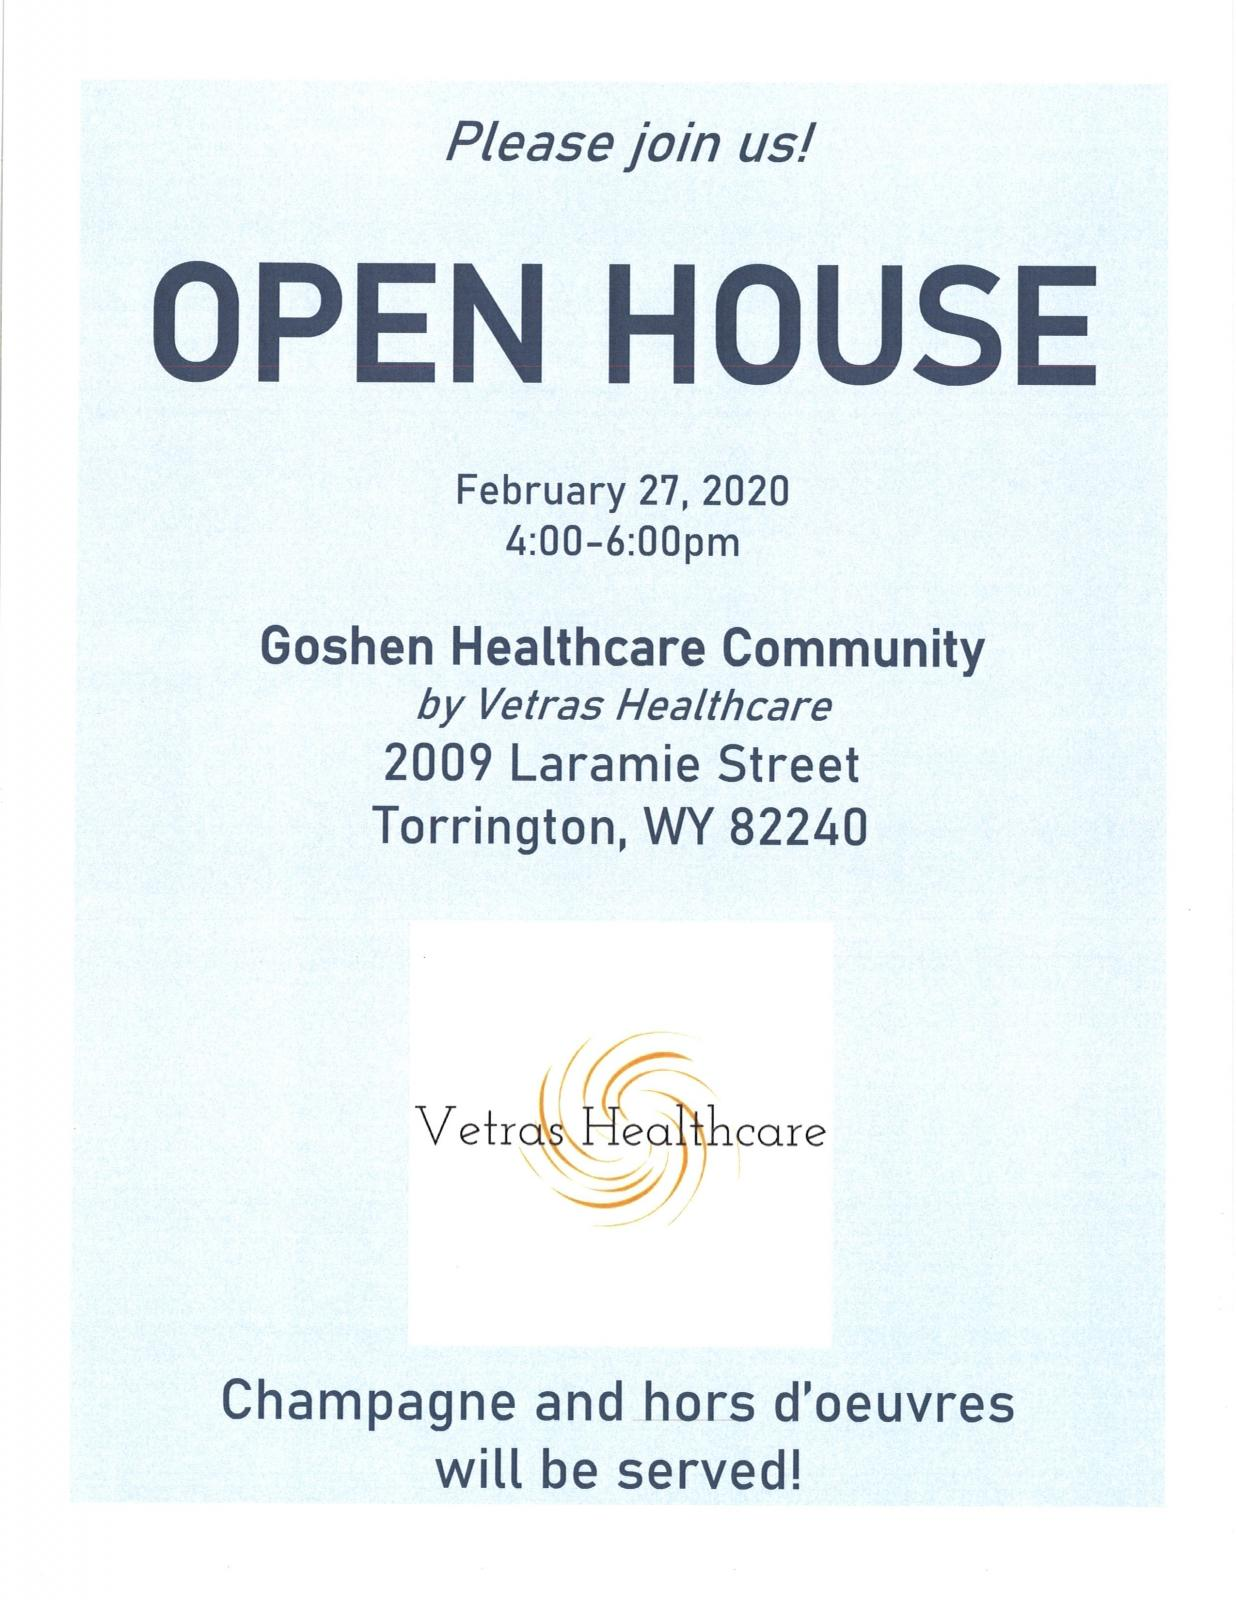 Open House - Goshen Healthcare Community Photo